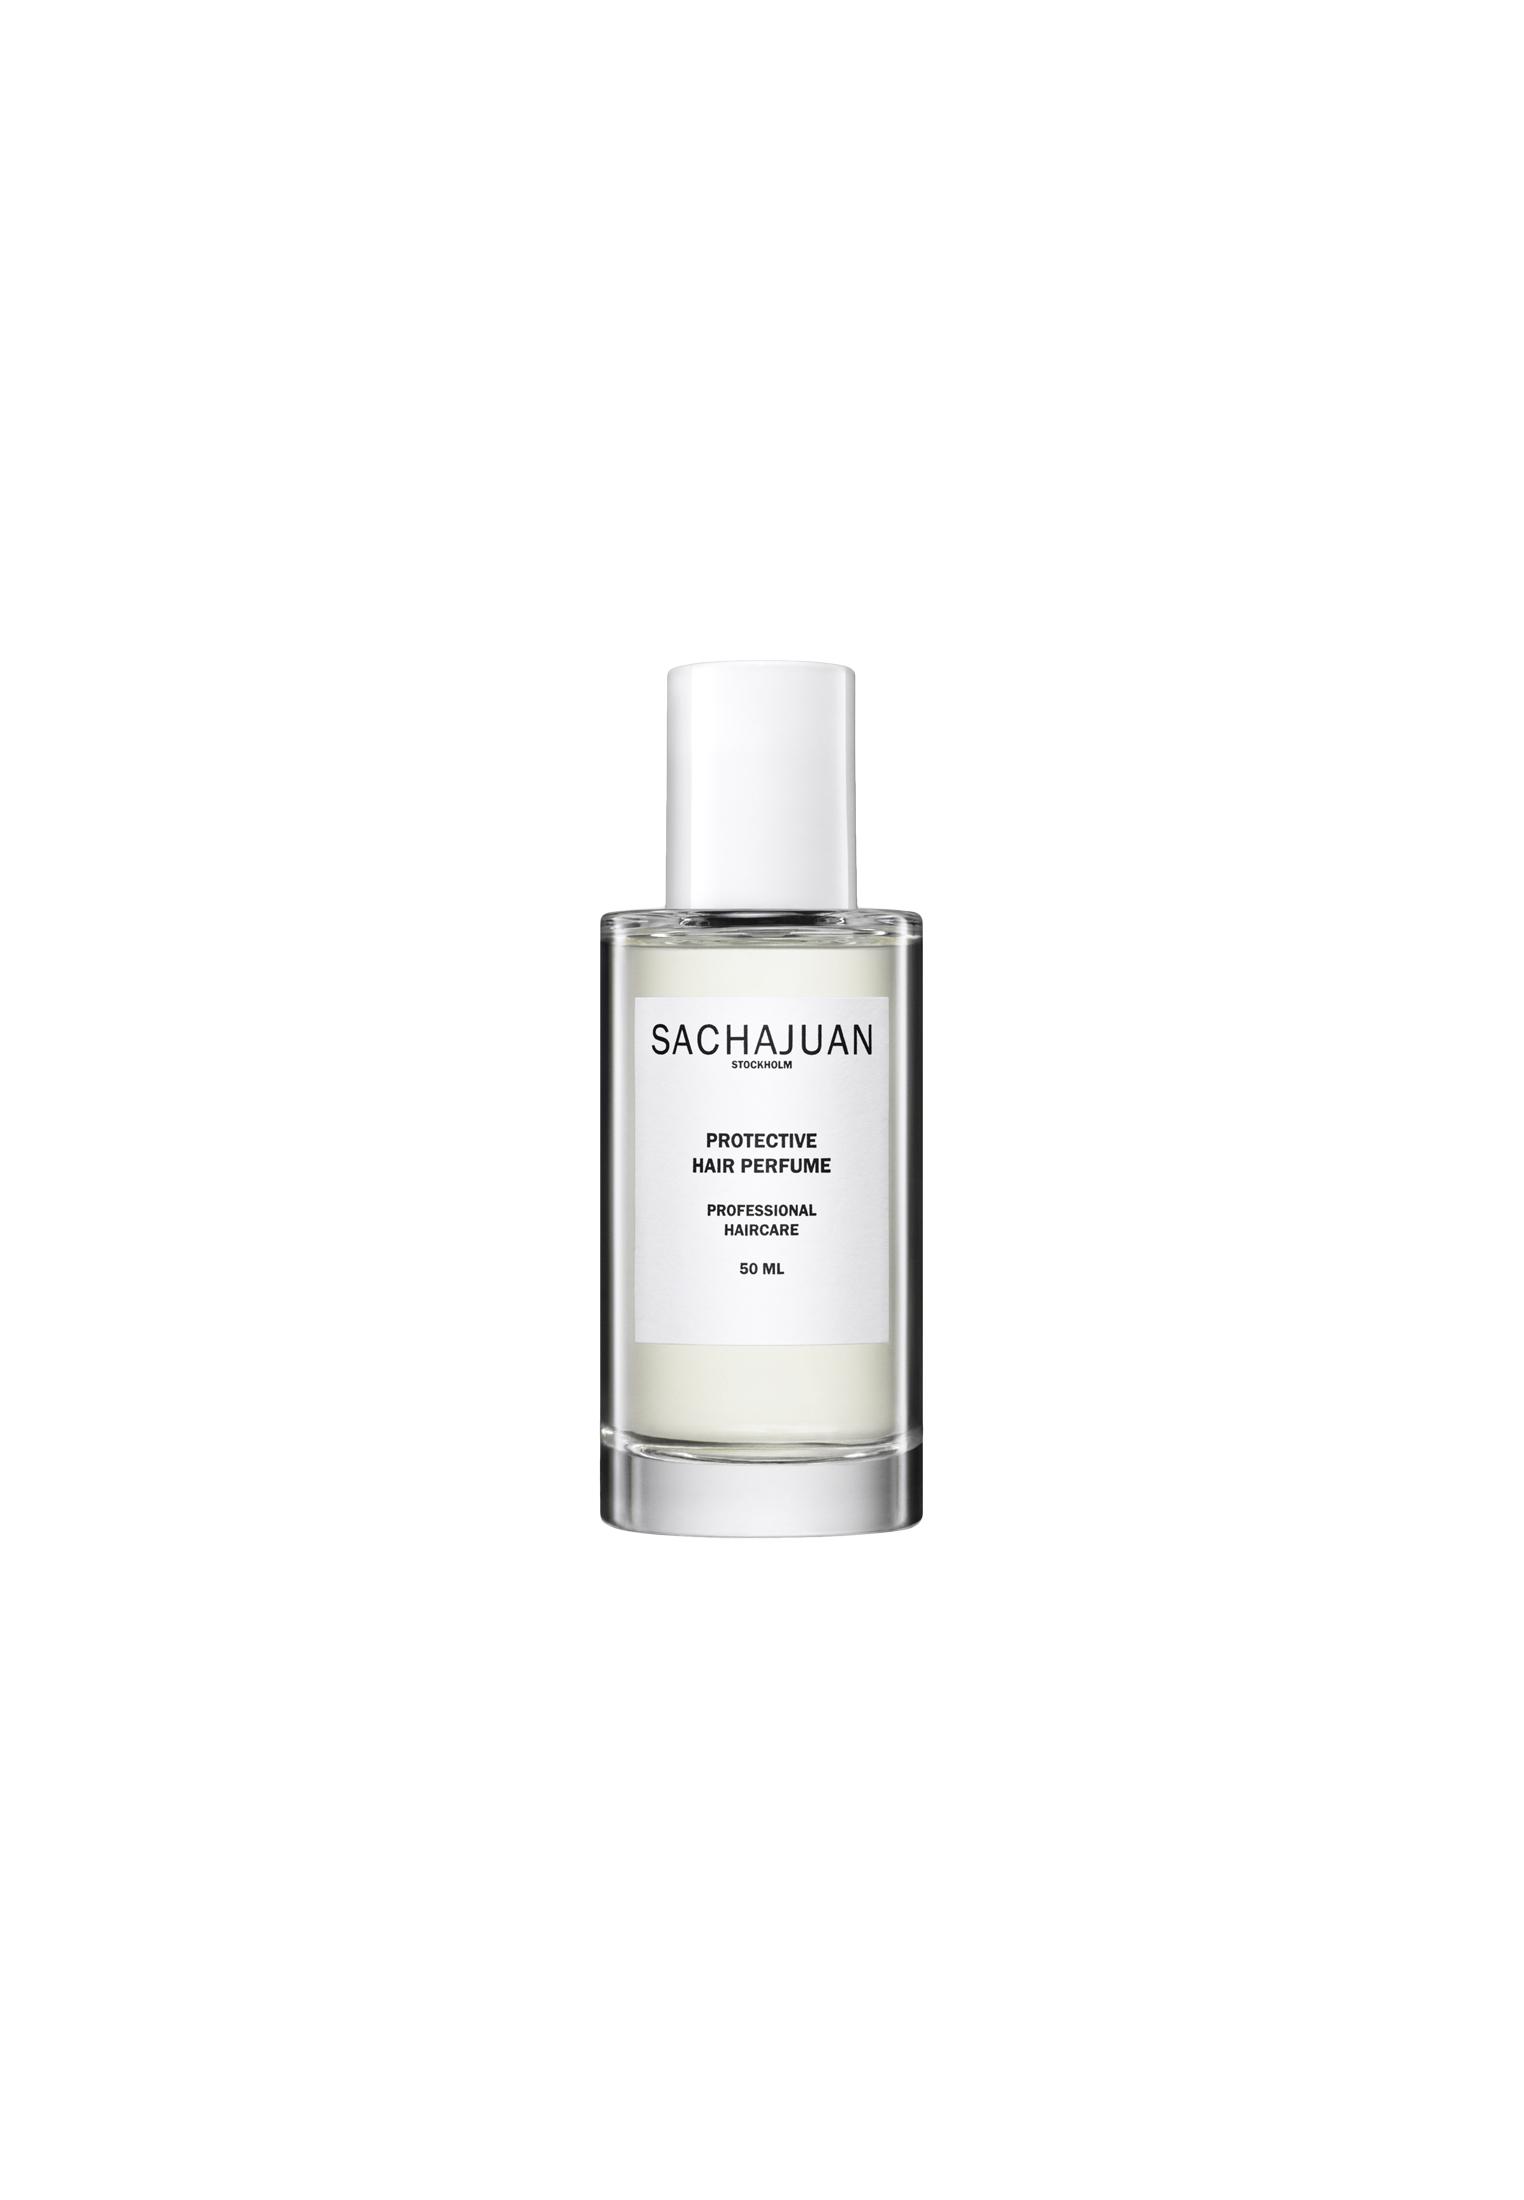 SACHAJUAN - Protective Hair Perfume - 50 ml